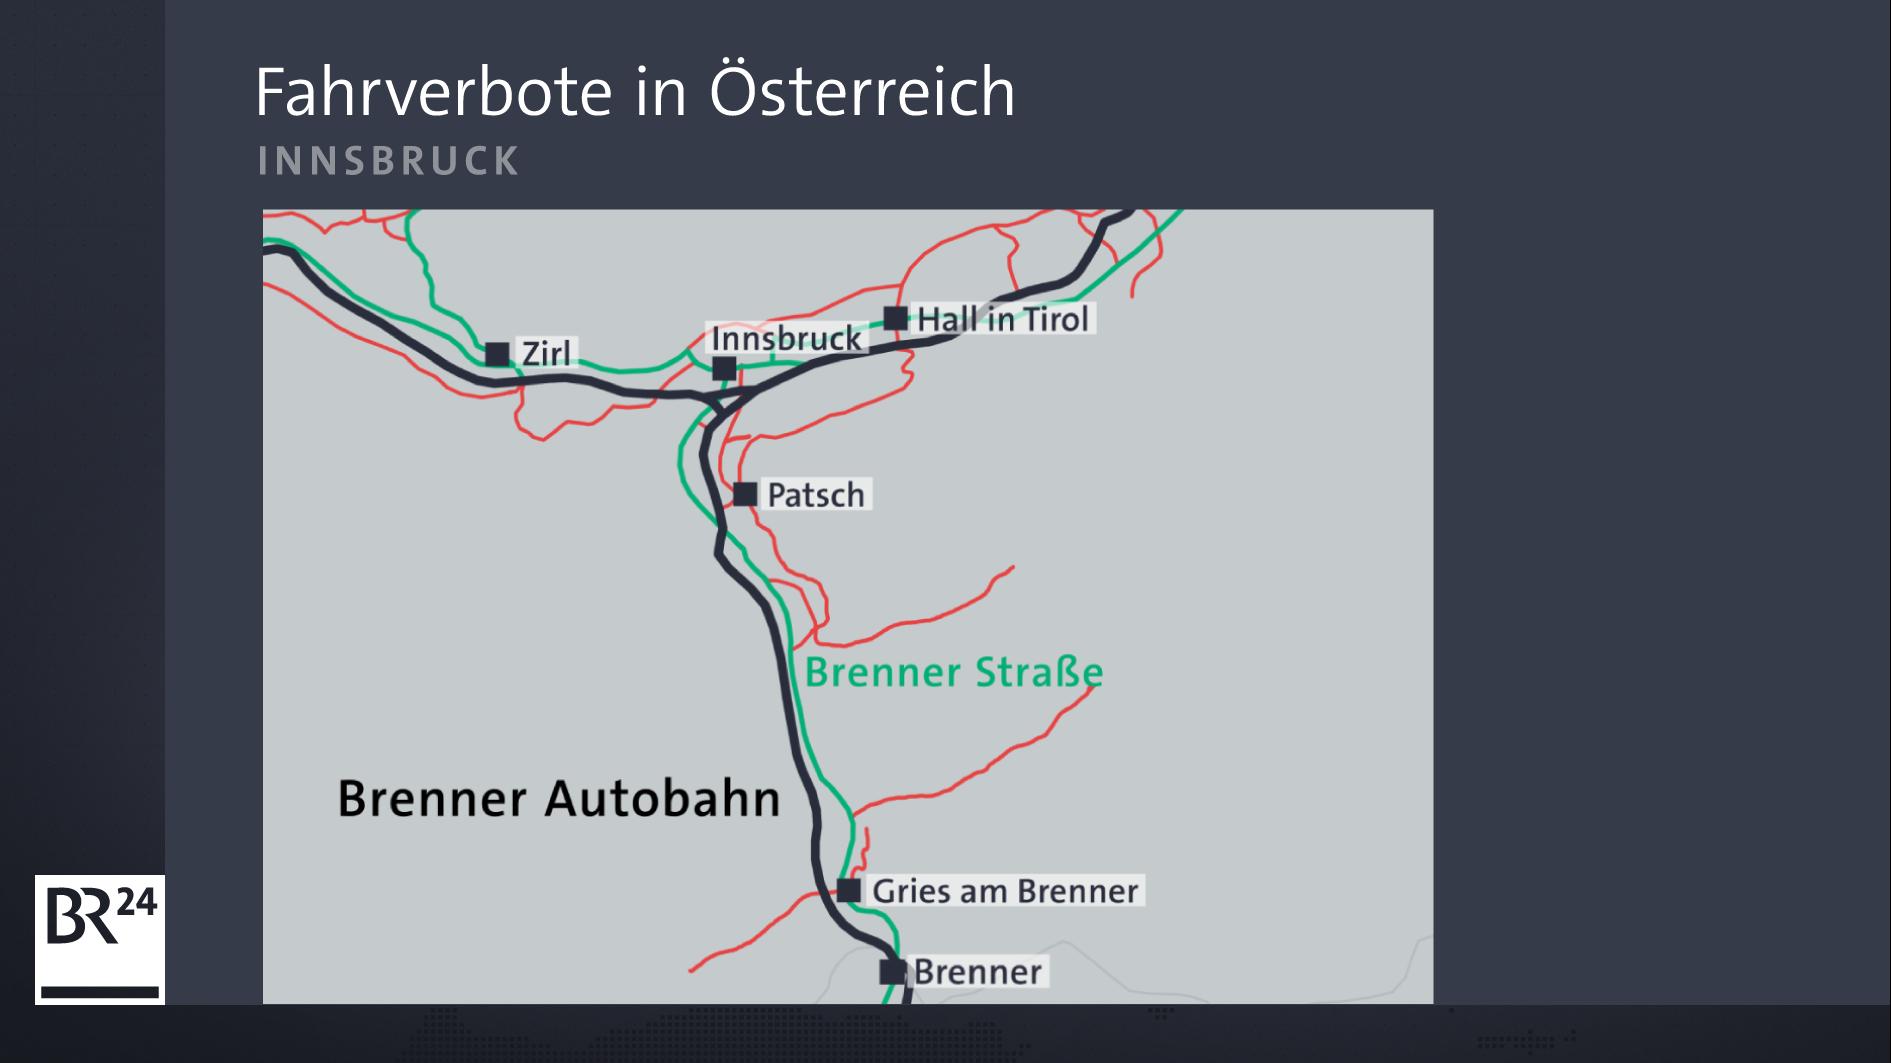 Fahrverbote bei Innsbruck